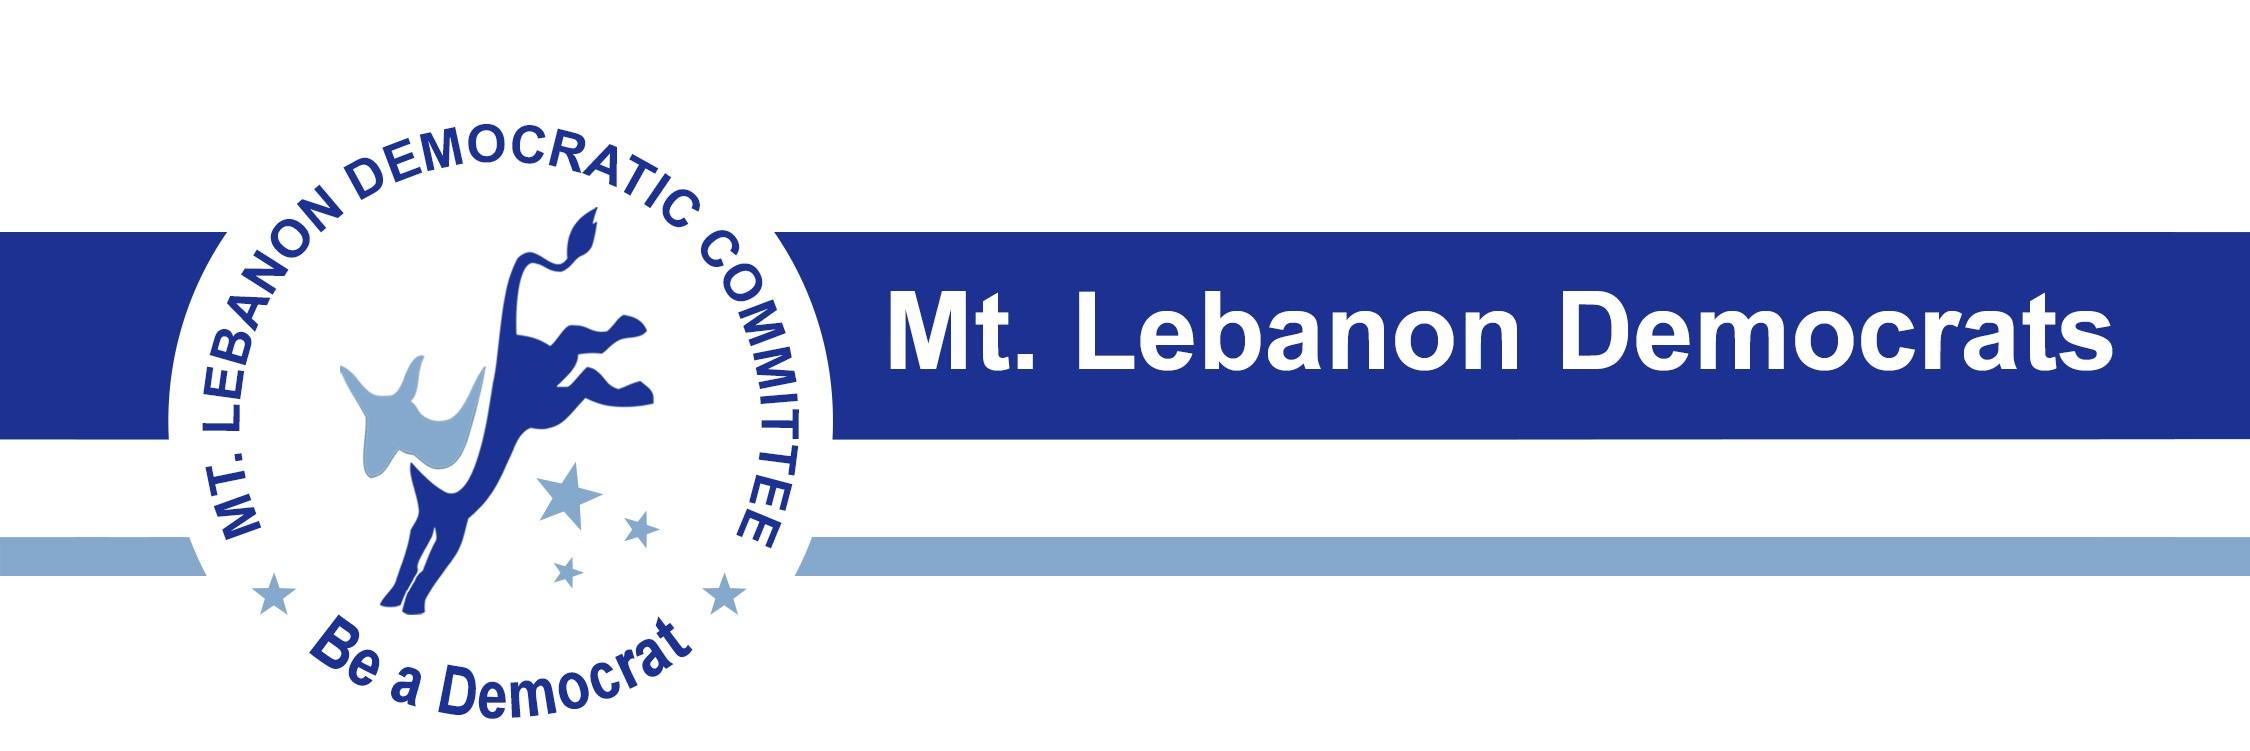 Mt. Lebanon Democratic Committee (PA)